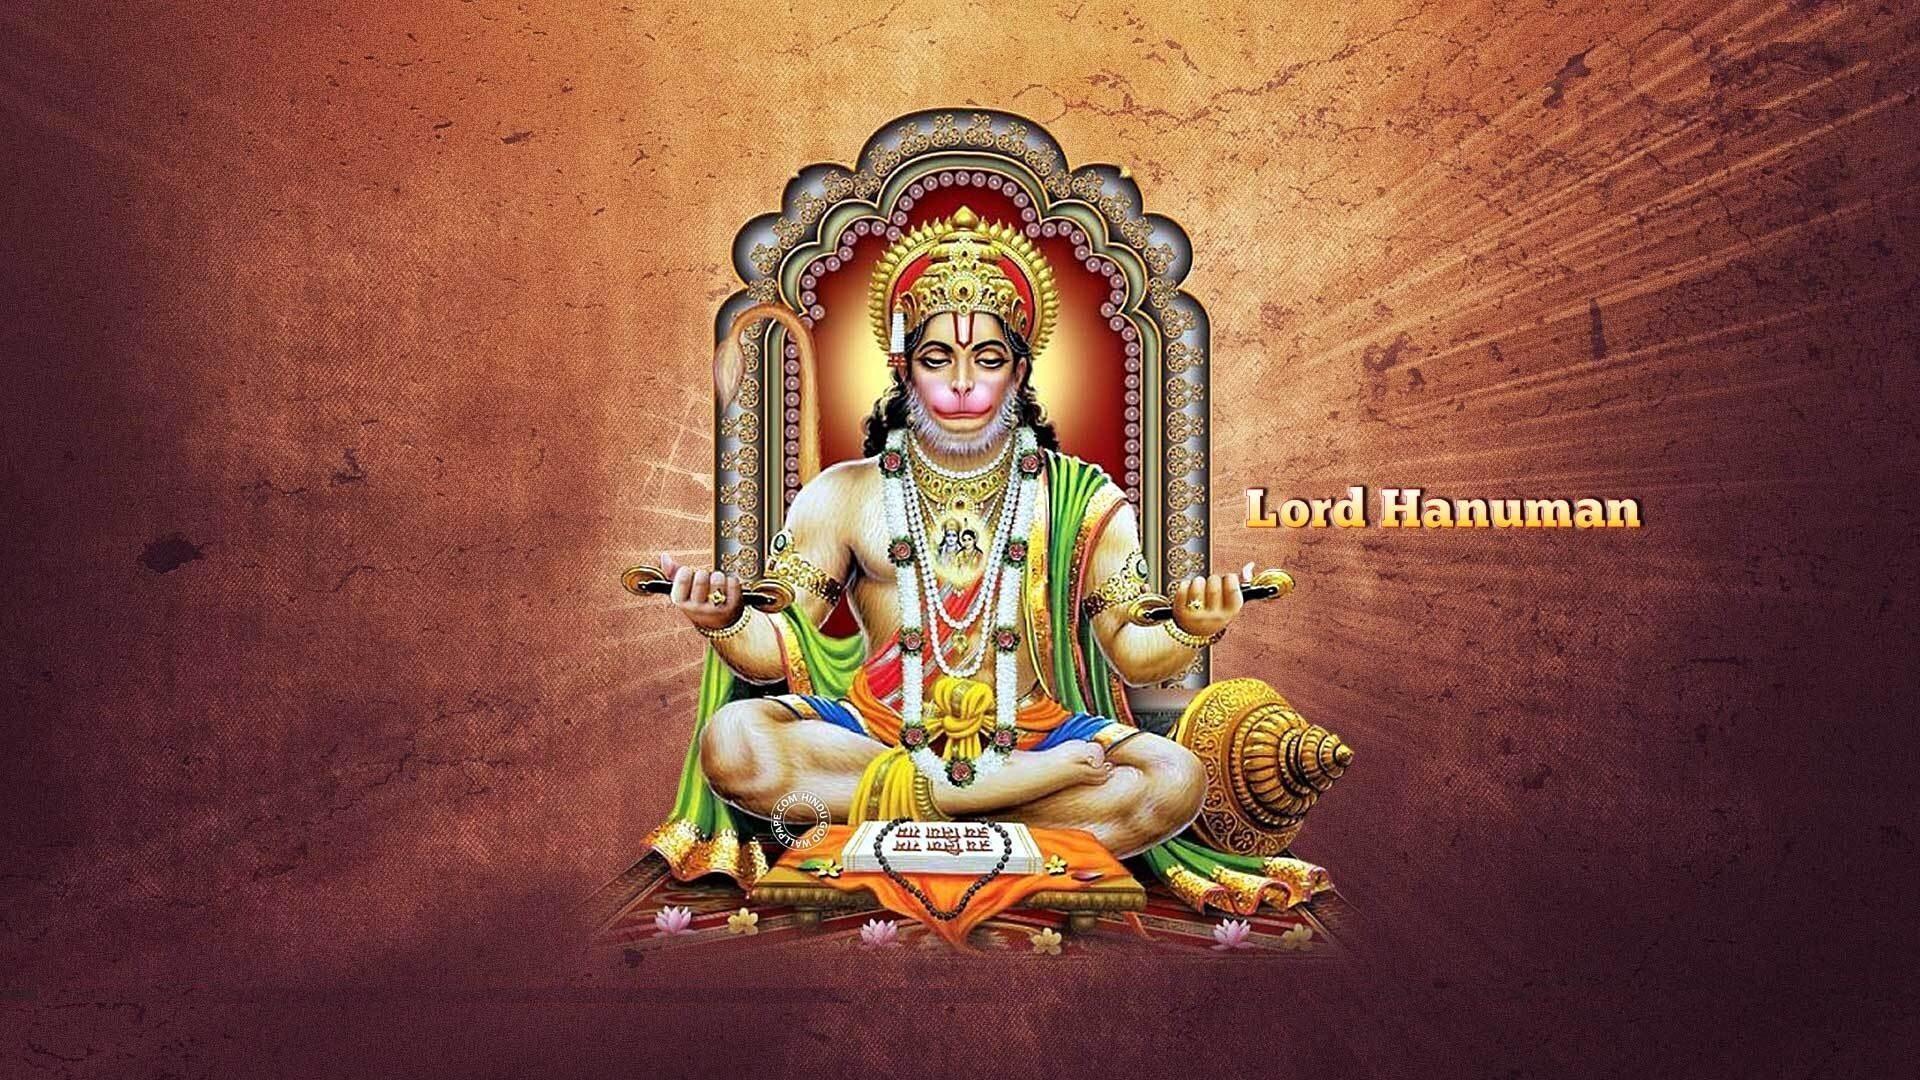 hindu lord hanuman hd wallpapers